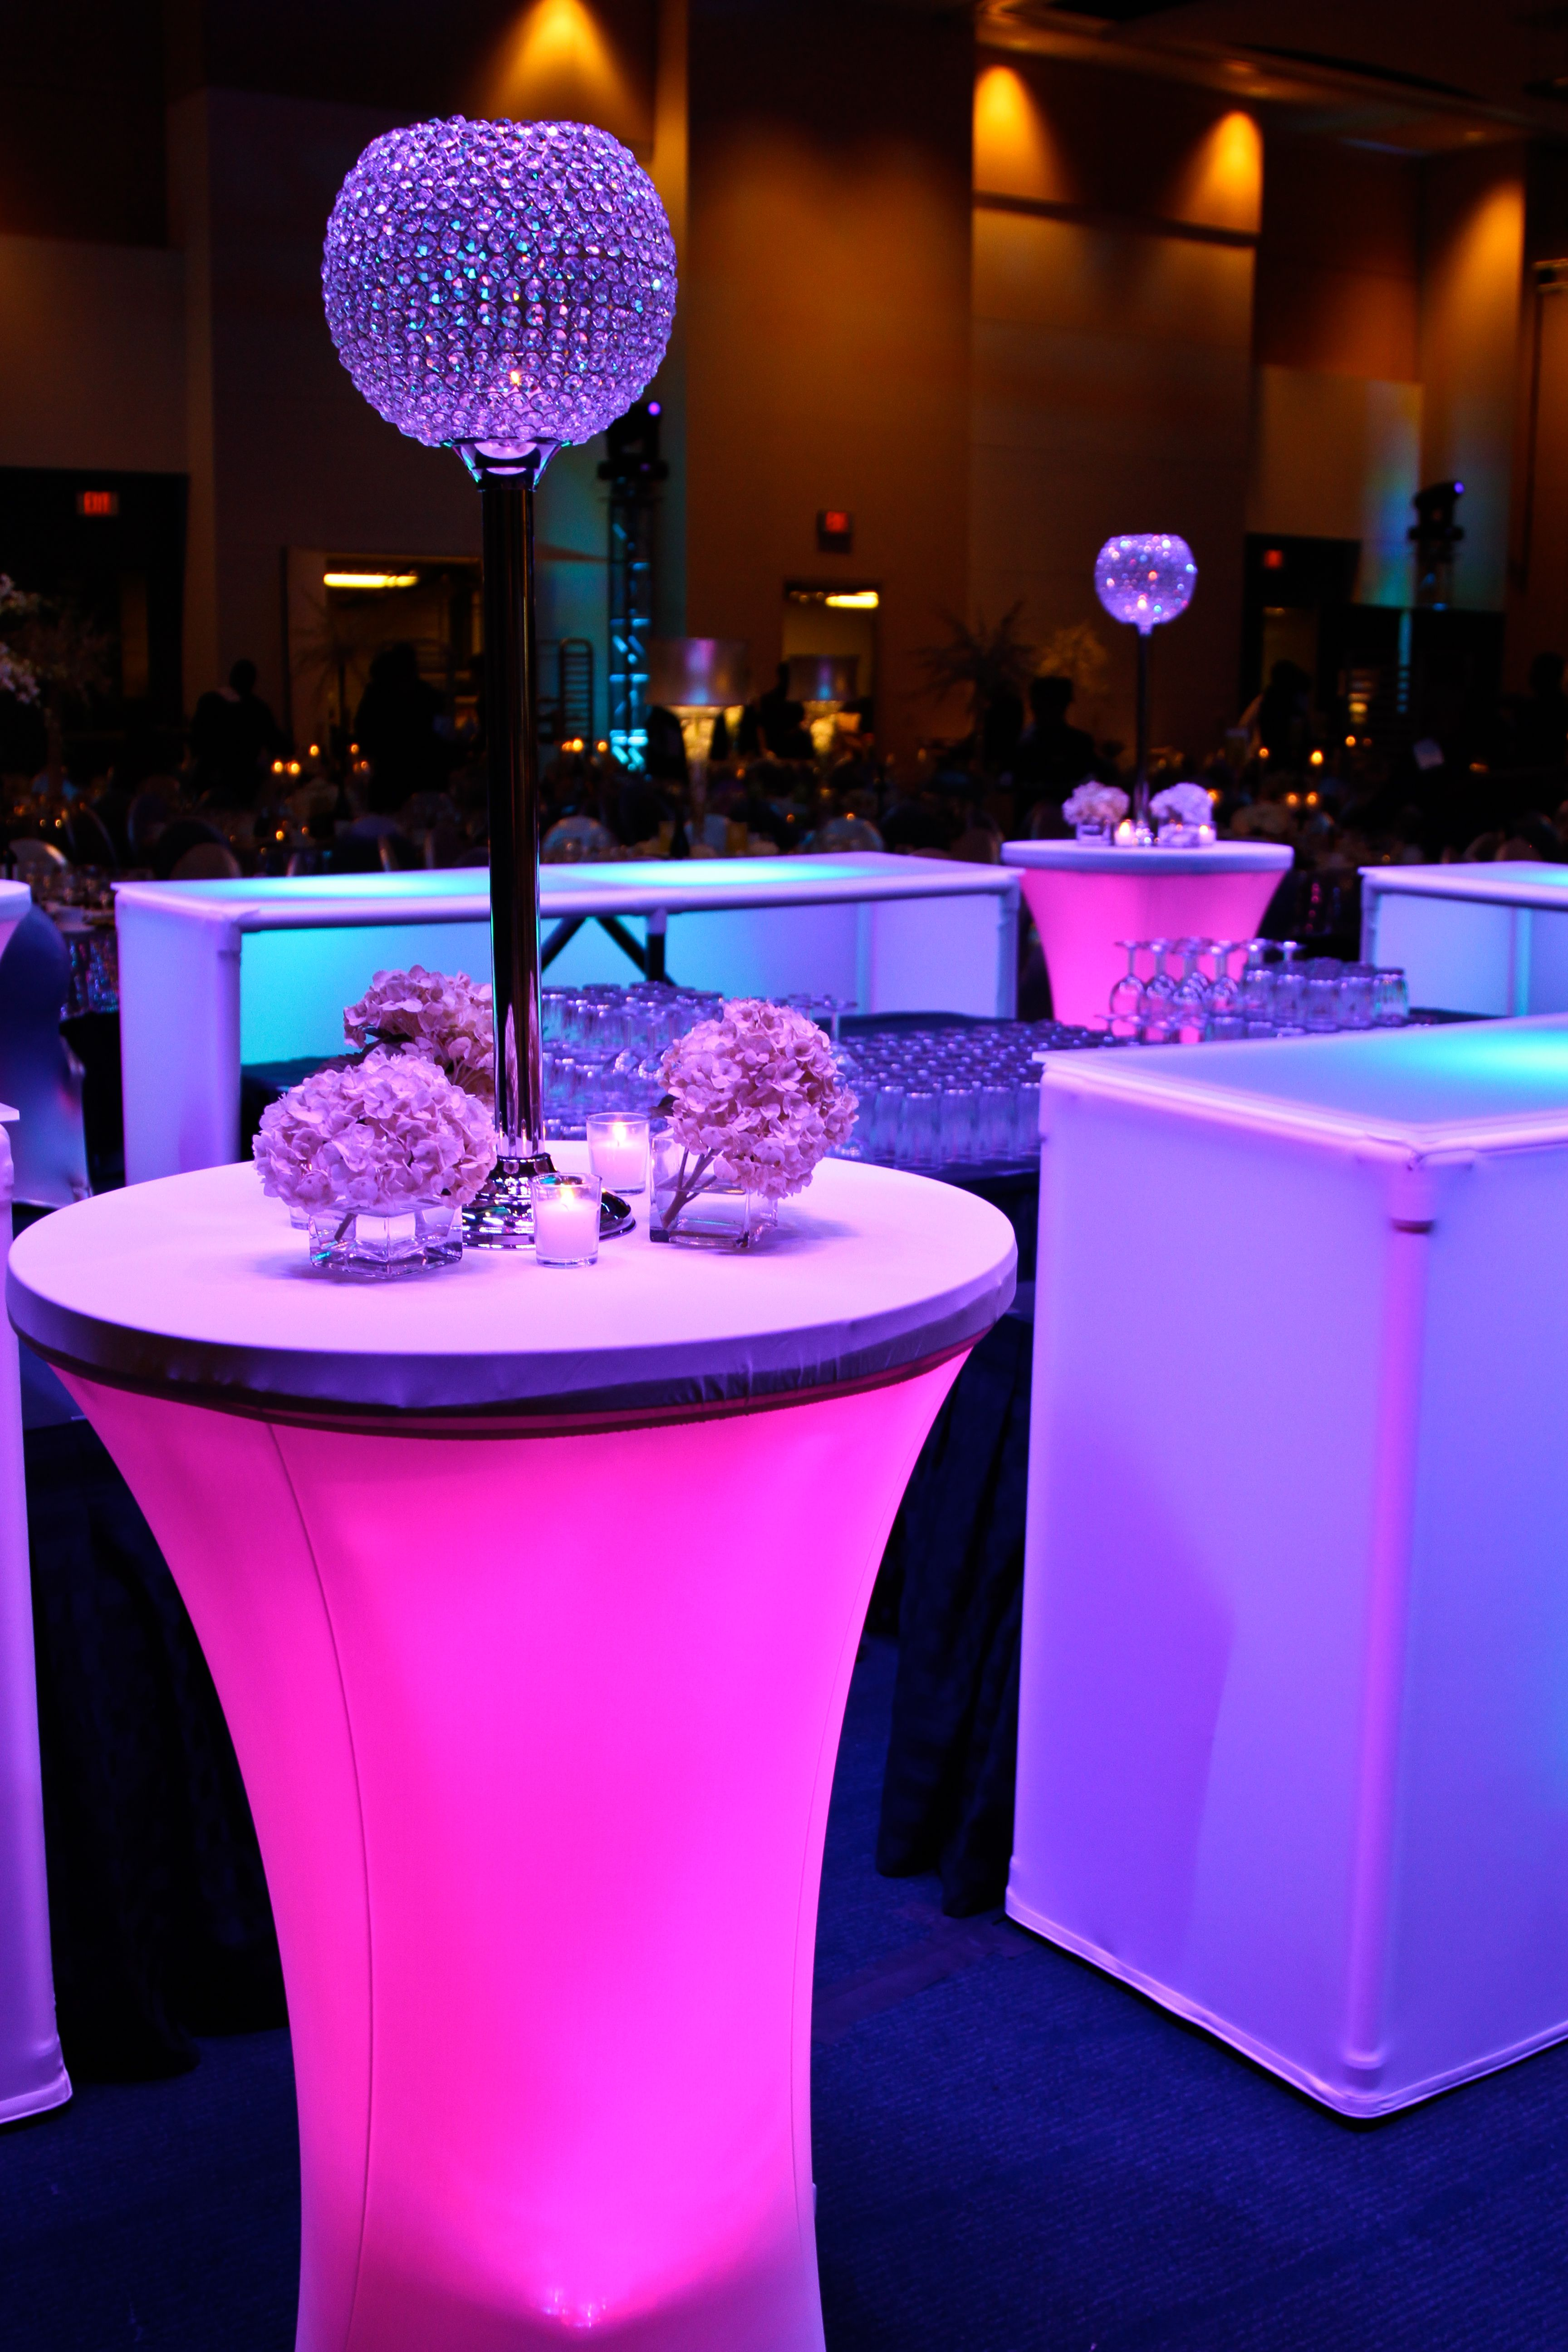 disco theme gala parties and other special events pinterest soir e ann e 80 ann e 80 et. Black Bedroom Furniture Sets. Home Design Ideas